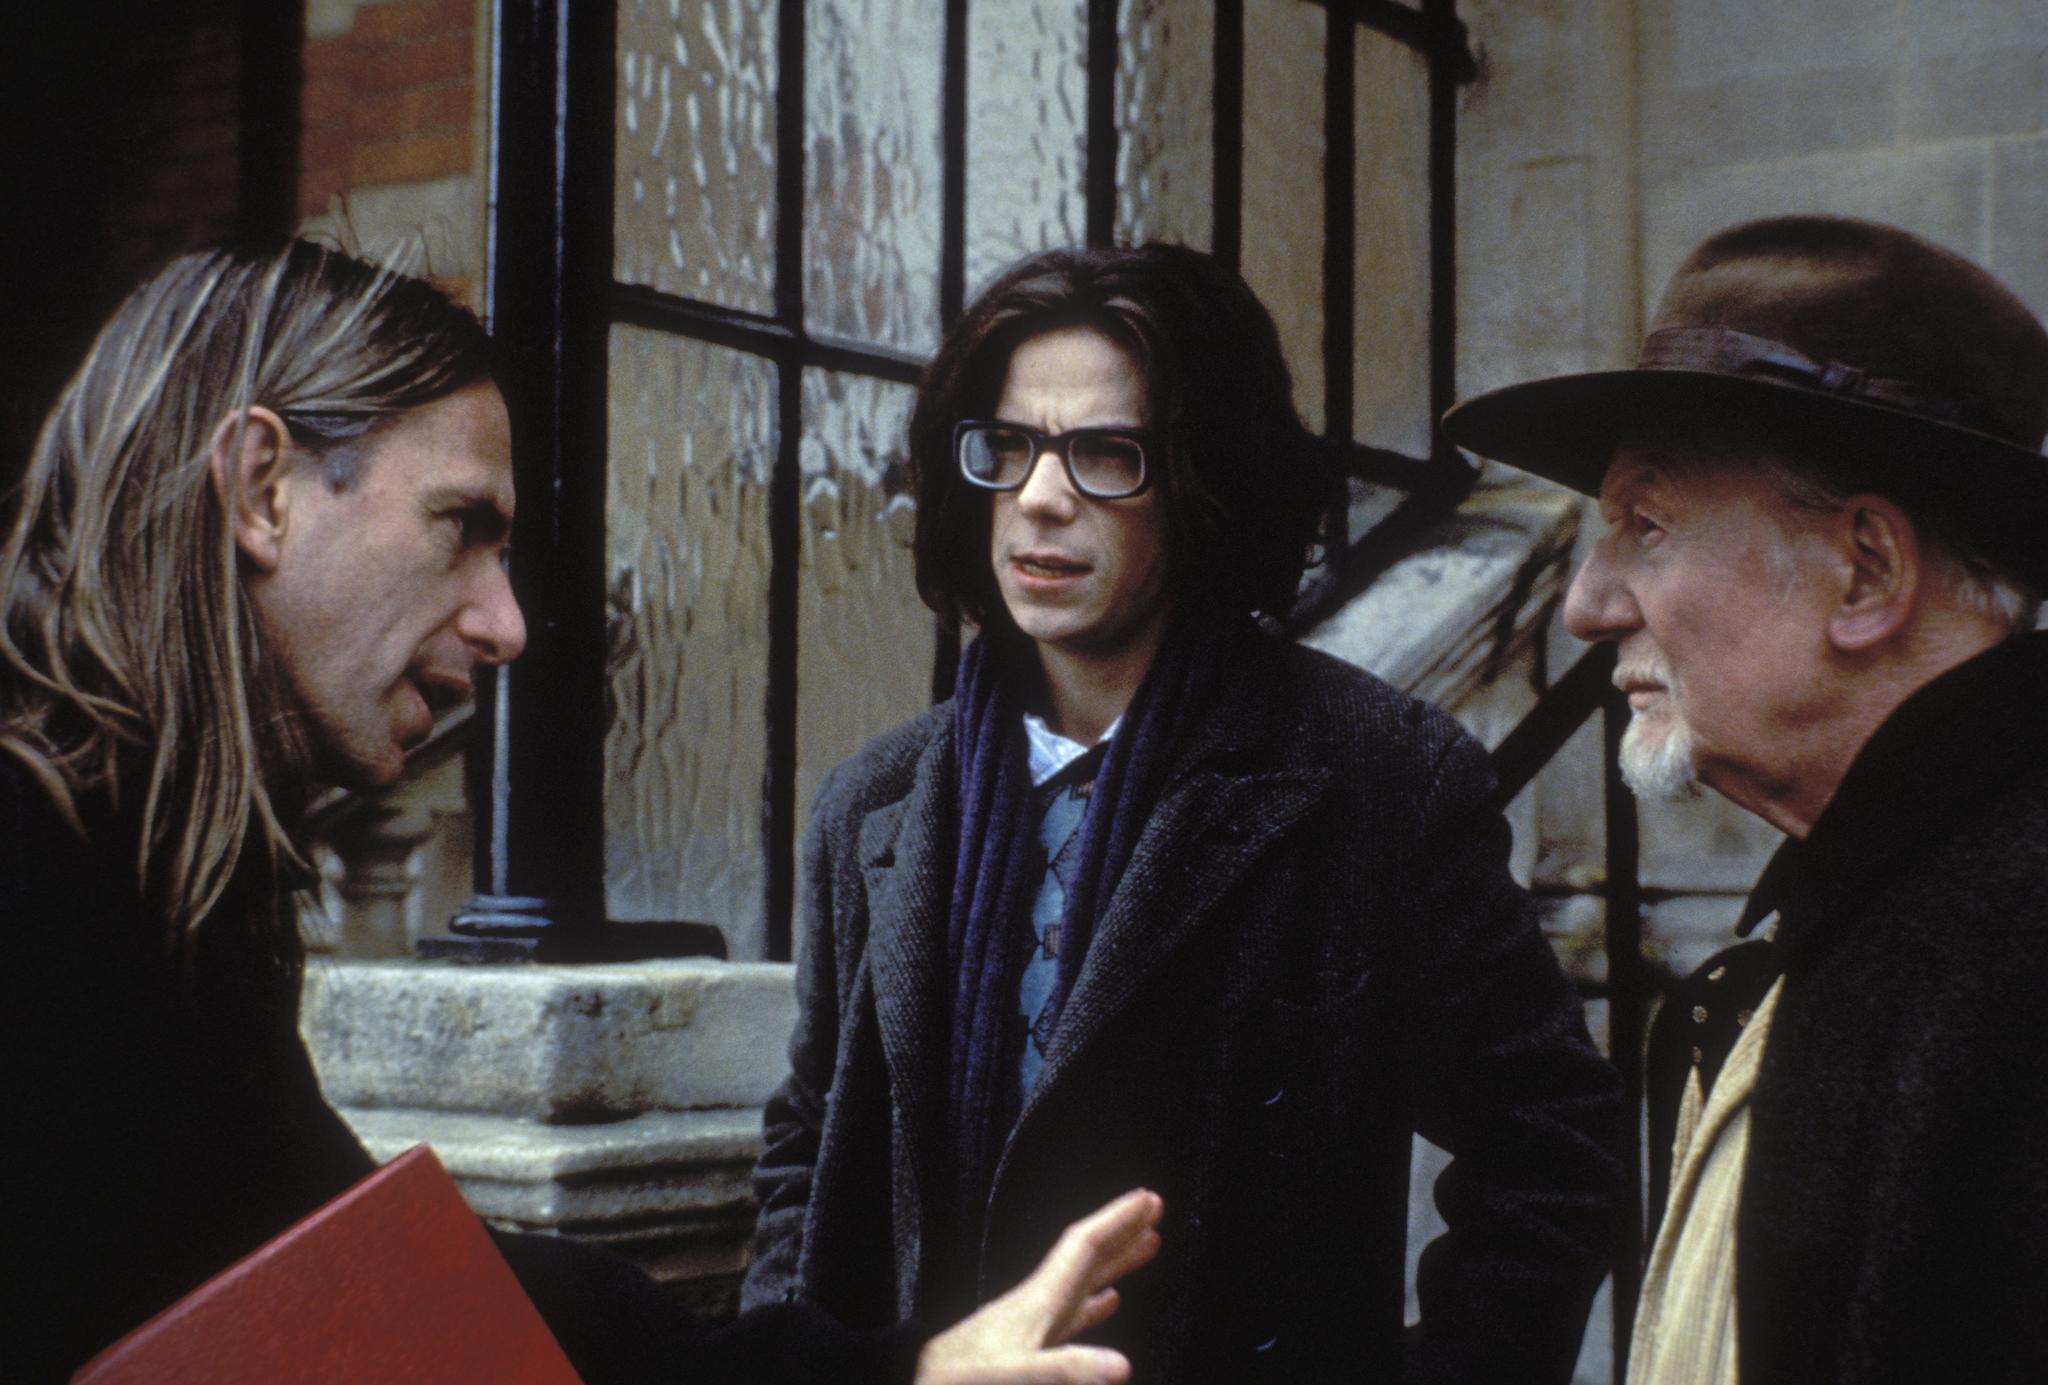 John Gielgud, Scott Hicks, and Noah Taylor in Shine (1996)